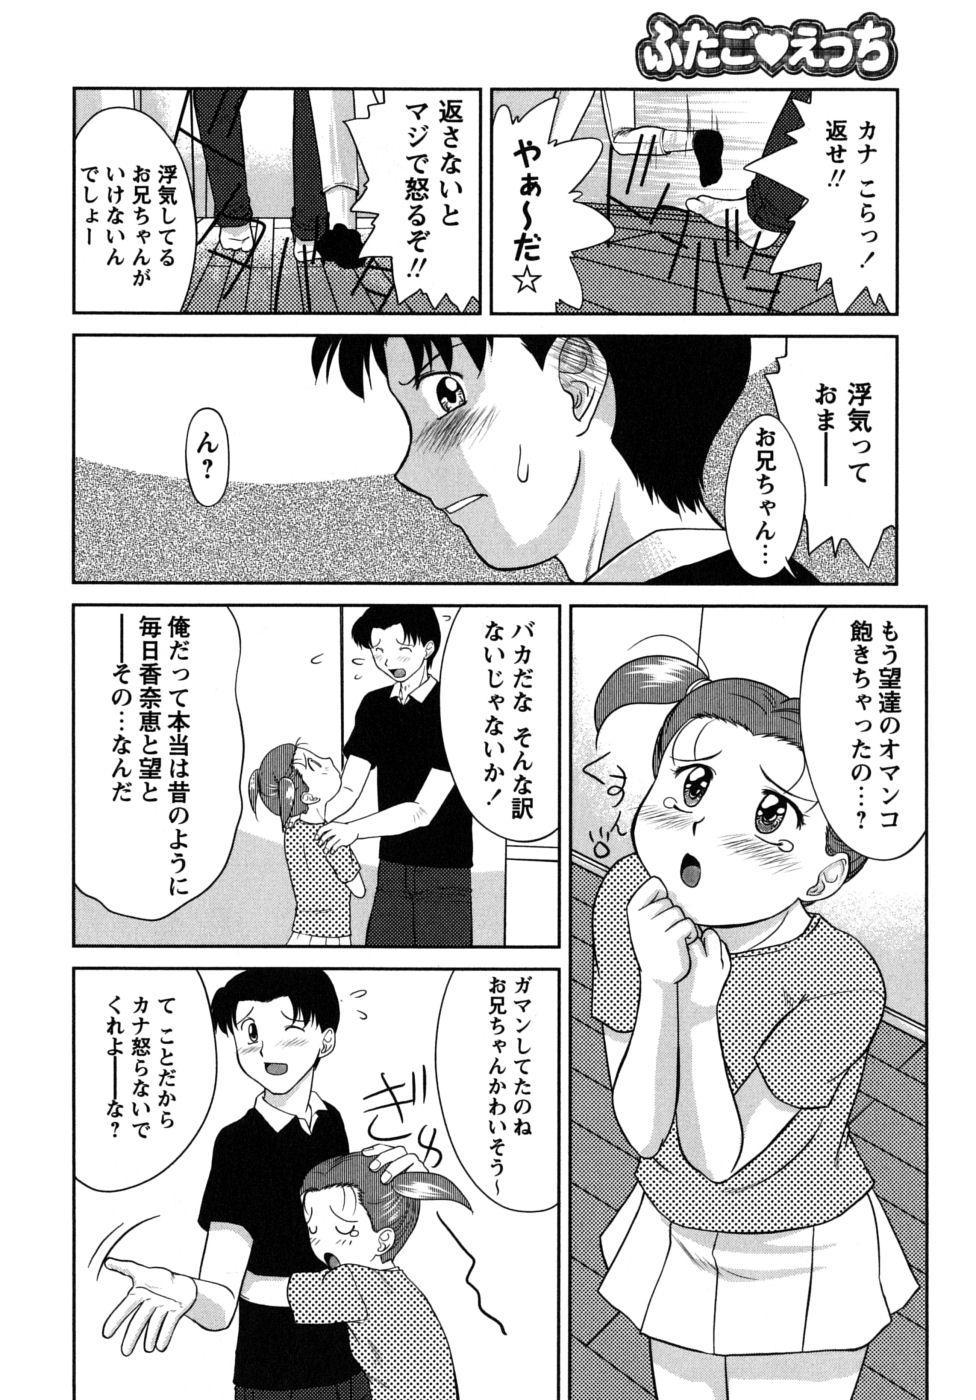 Futa Go Ecchi 109